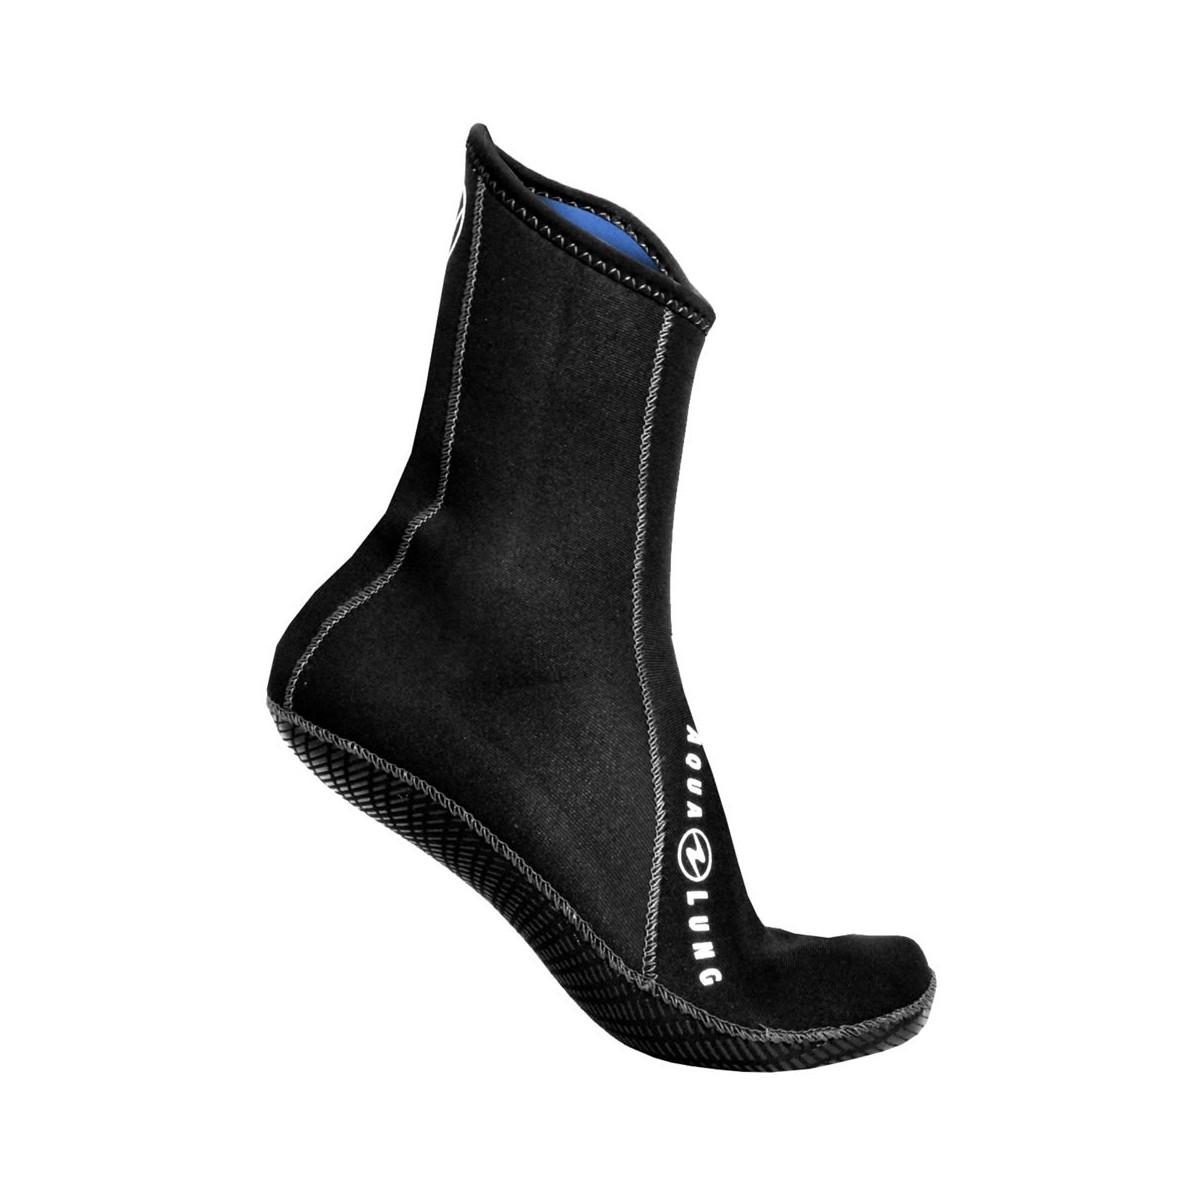 Aqua Lung Ergo Neoprene Sock: High Top with Grip